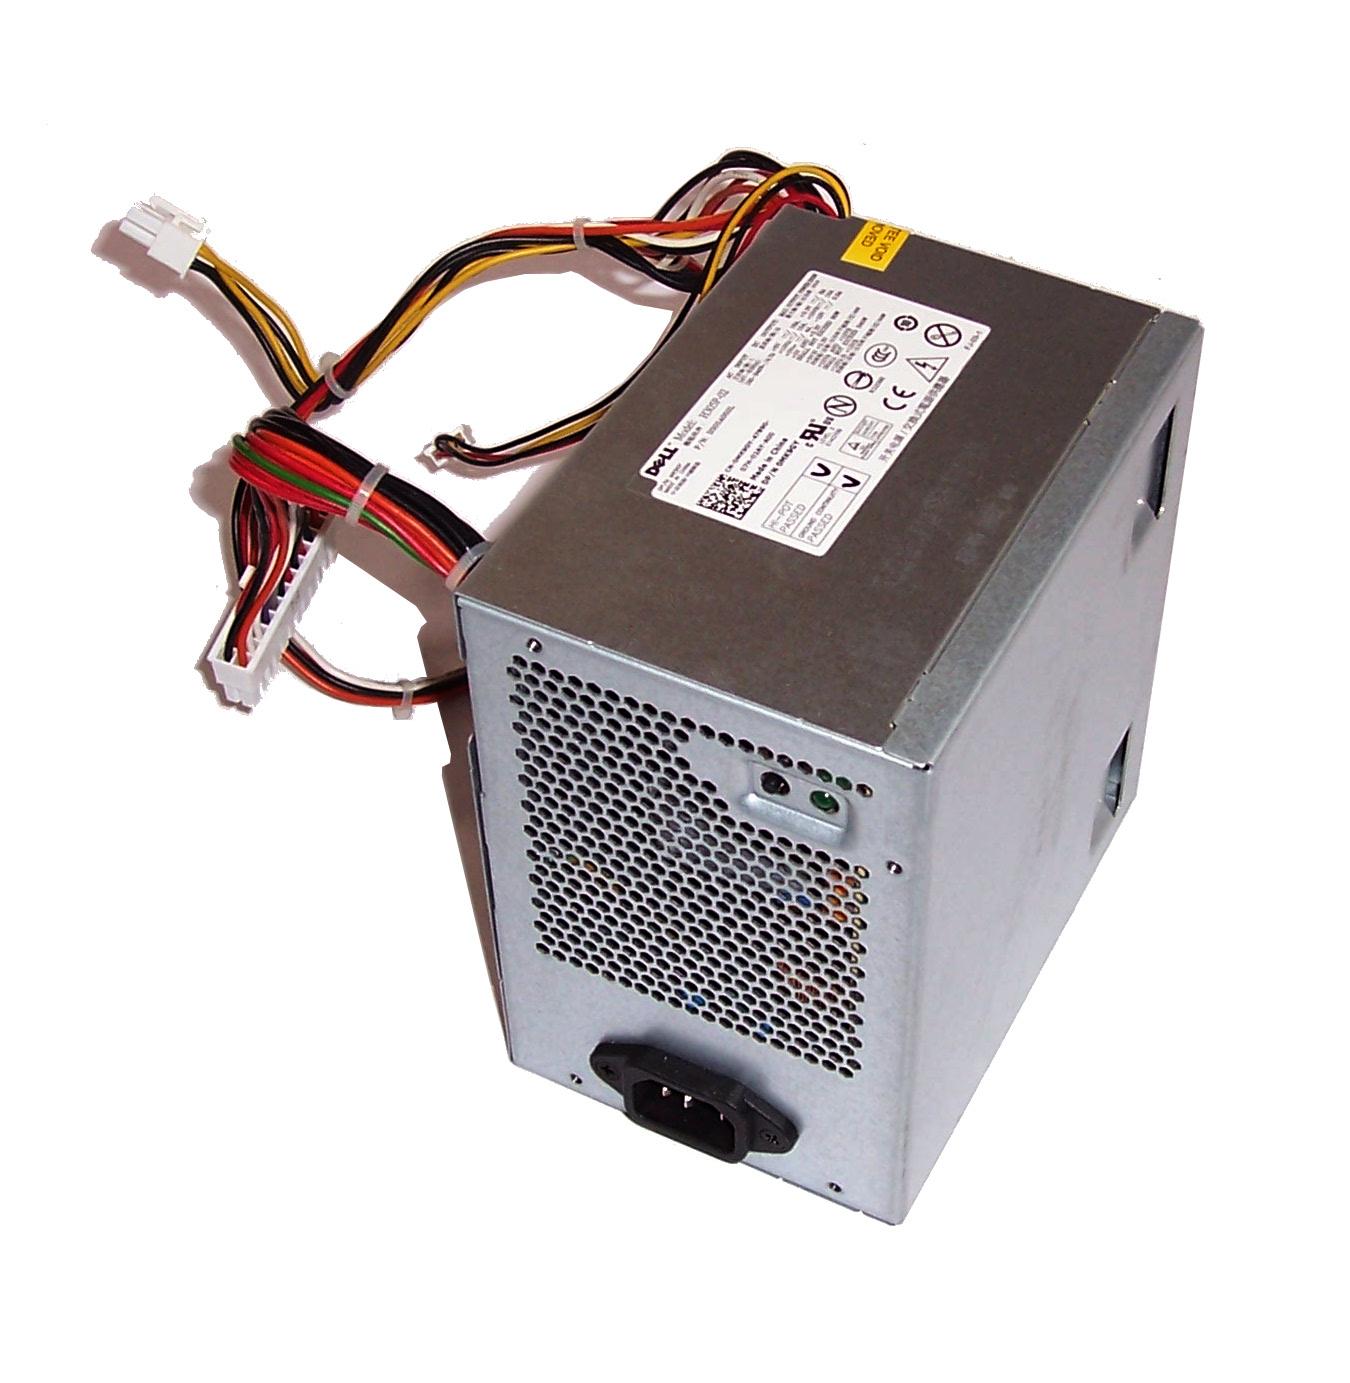 Dell K346R Optiplex Mini Tower 305W Power Supply H305P-02